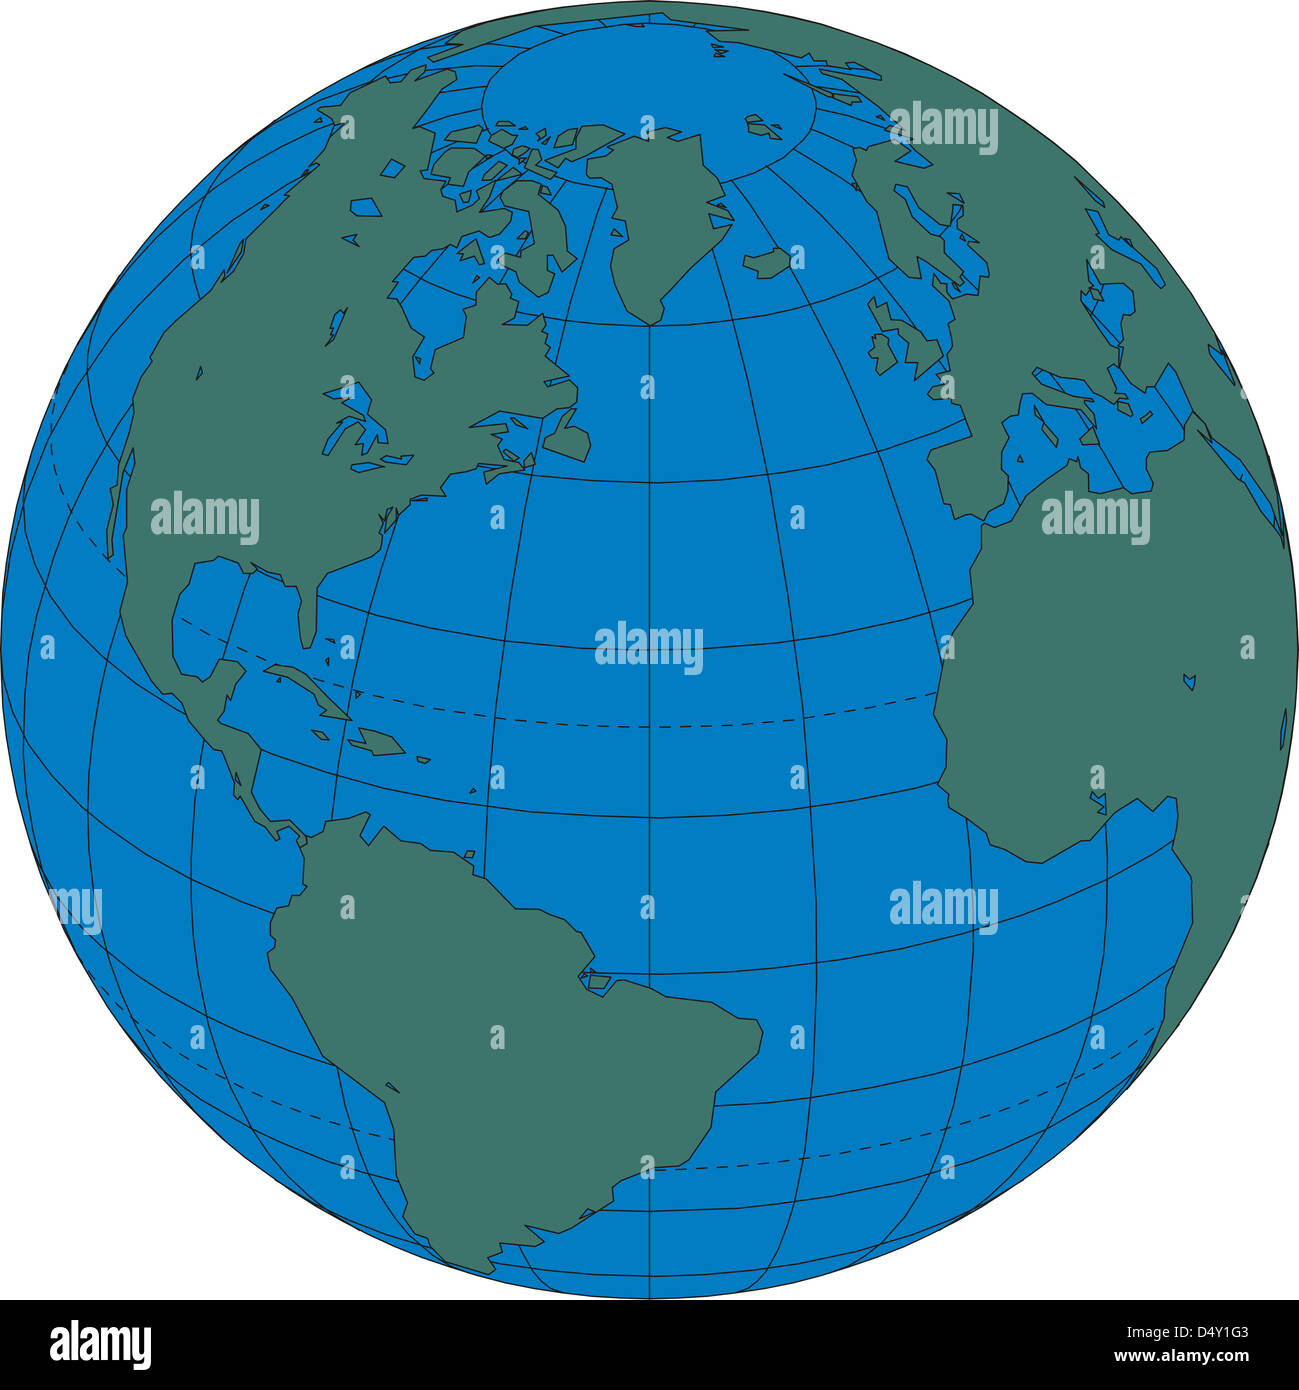 World map globe North Atlantic Ocean Stock Photo Royalty Free